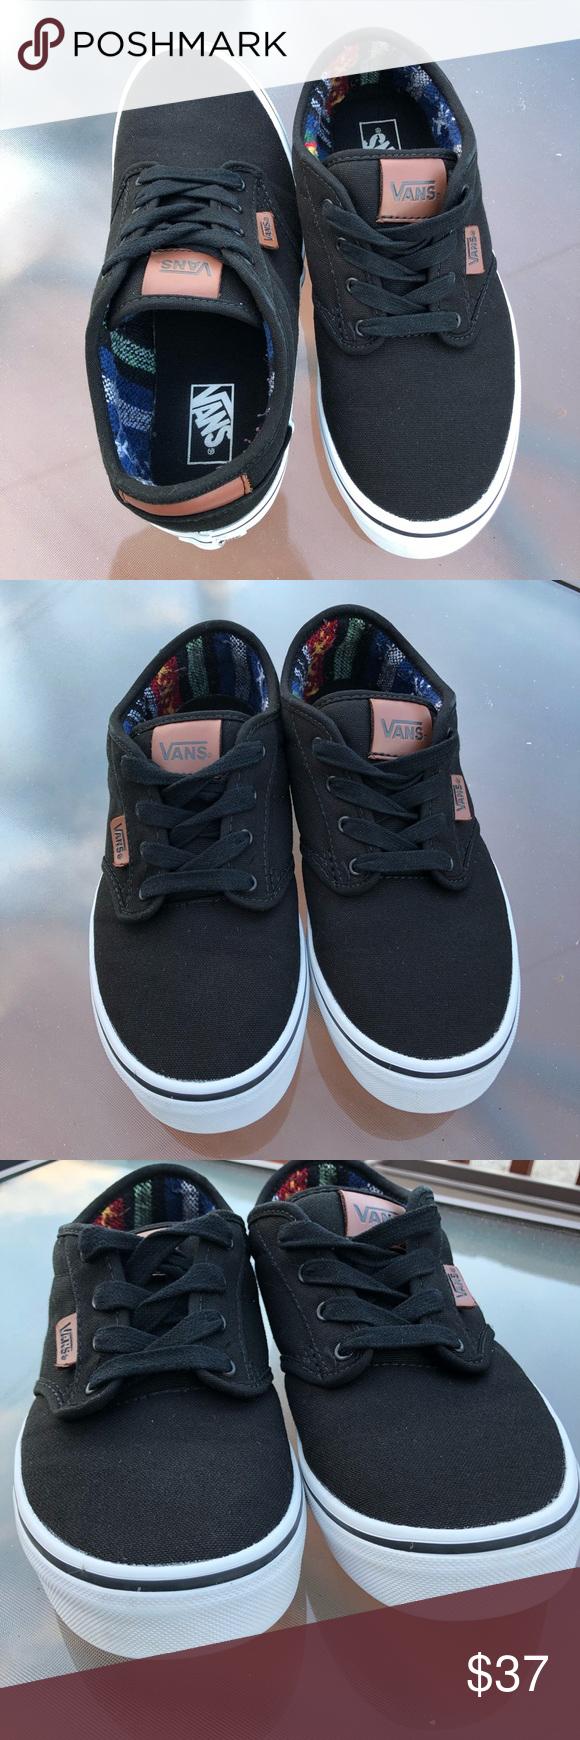 b071b88ac17 VANS Classic Skate Shoe Canvas Leather Trim TB4R VANS Classic Canvas Skate  Shoe Color  Black